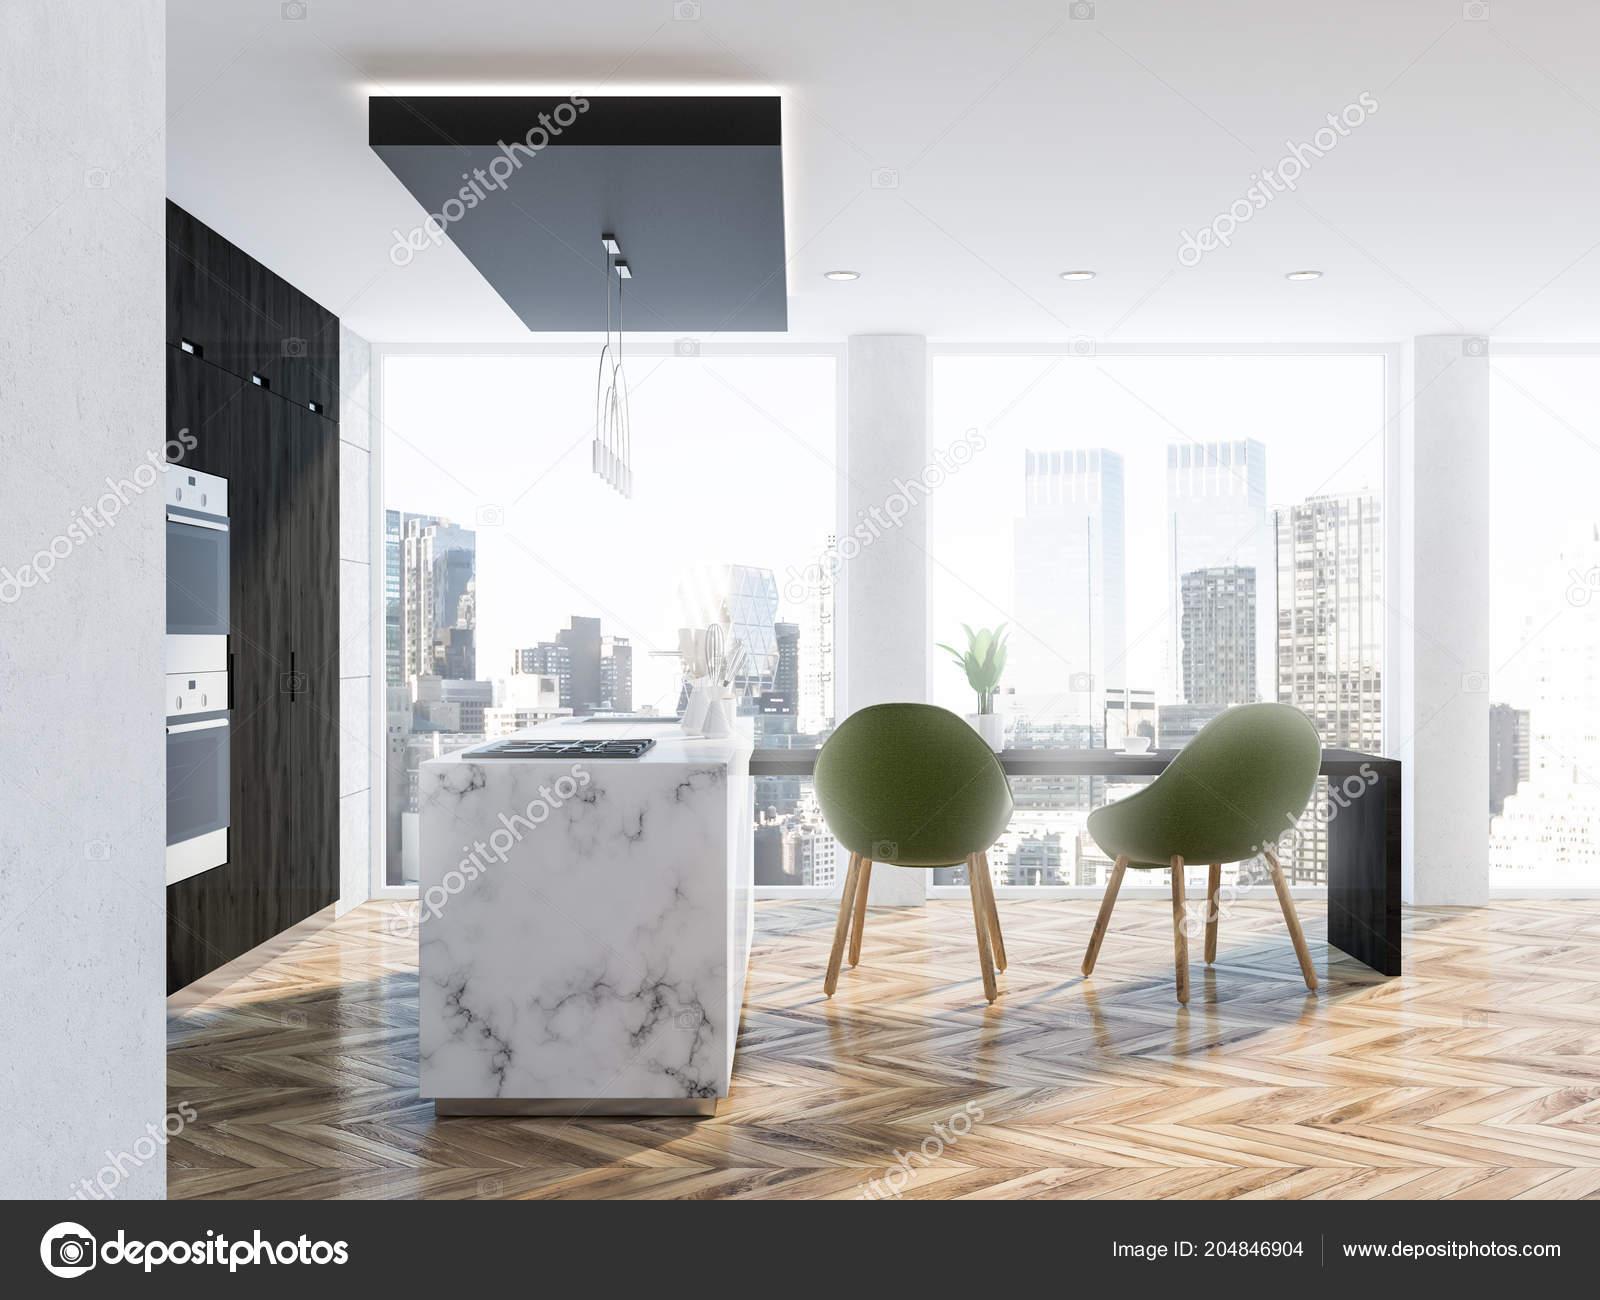 Loft Kitchen Interior White Marble Walls Wooden Floor Marble Countertops Stock Photo C Denisismagilov 204846904